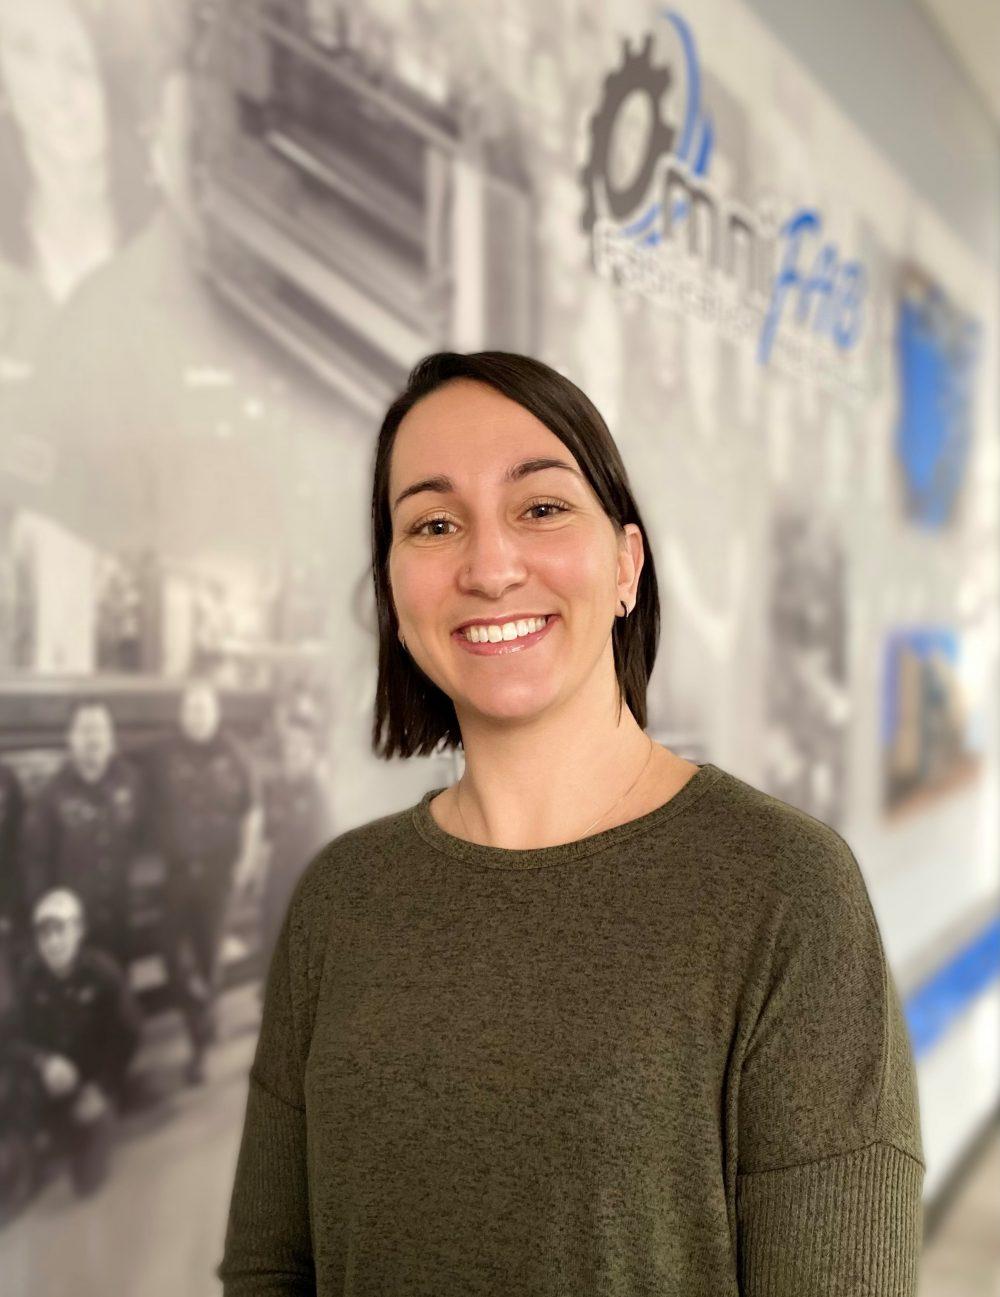 Sophie Verreault | administratrice représentante siège Individu